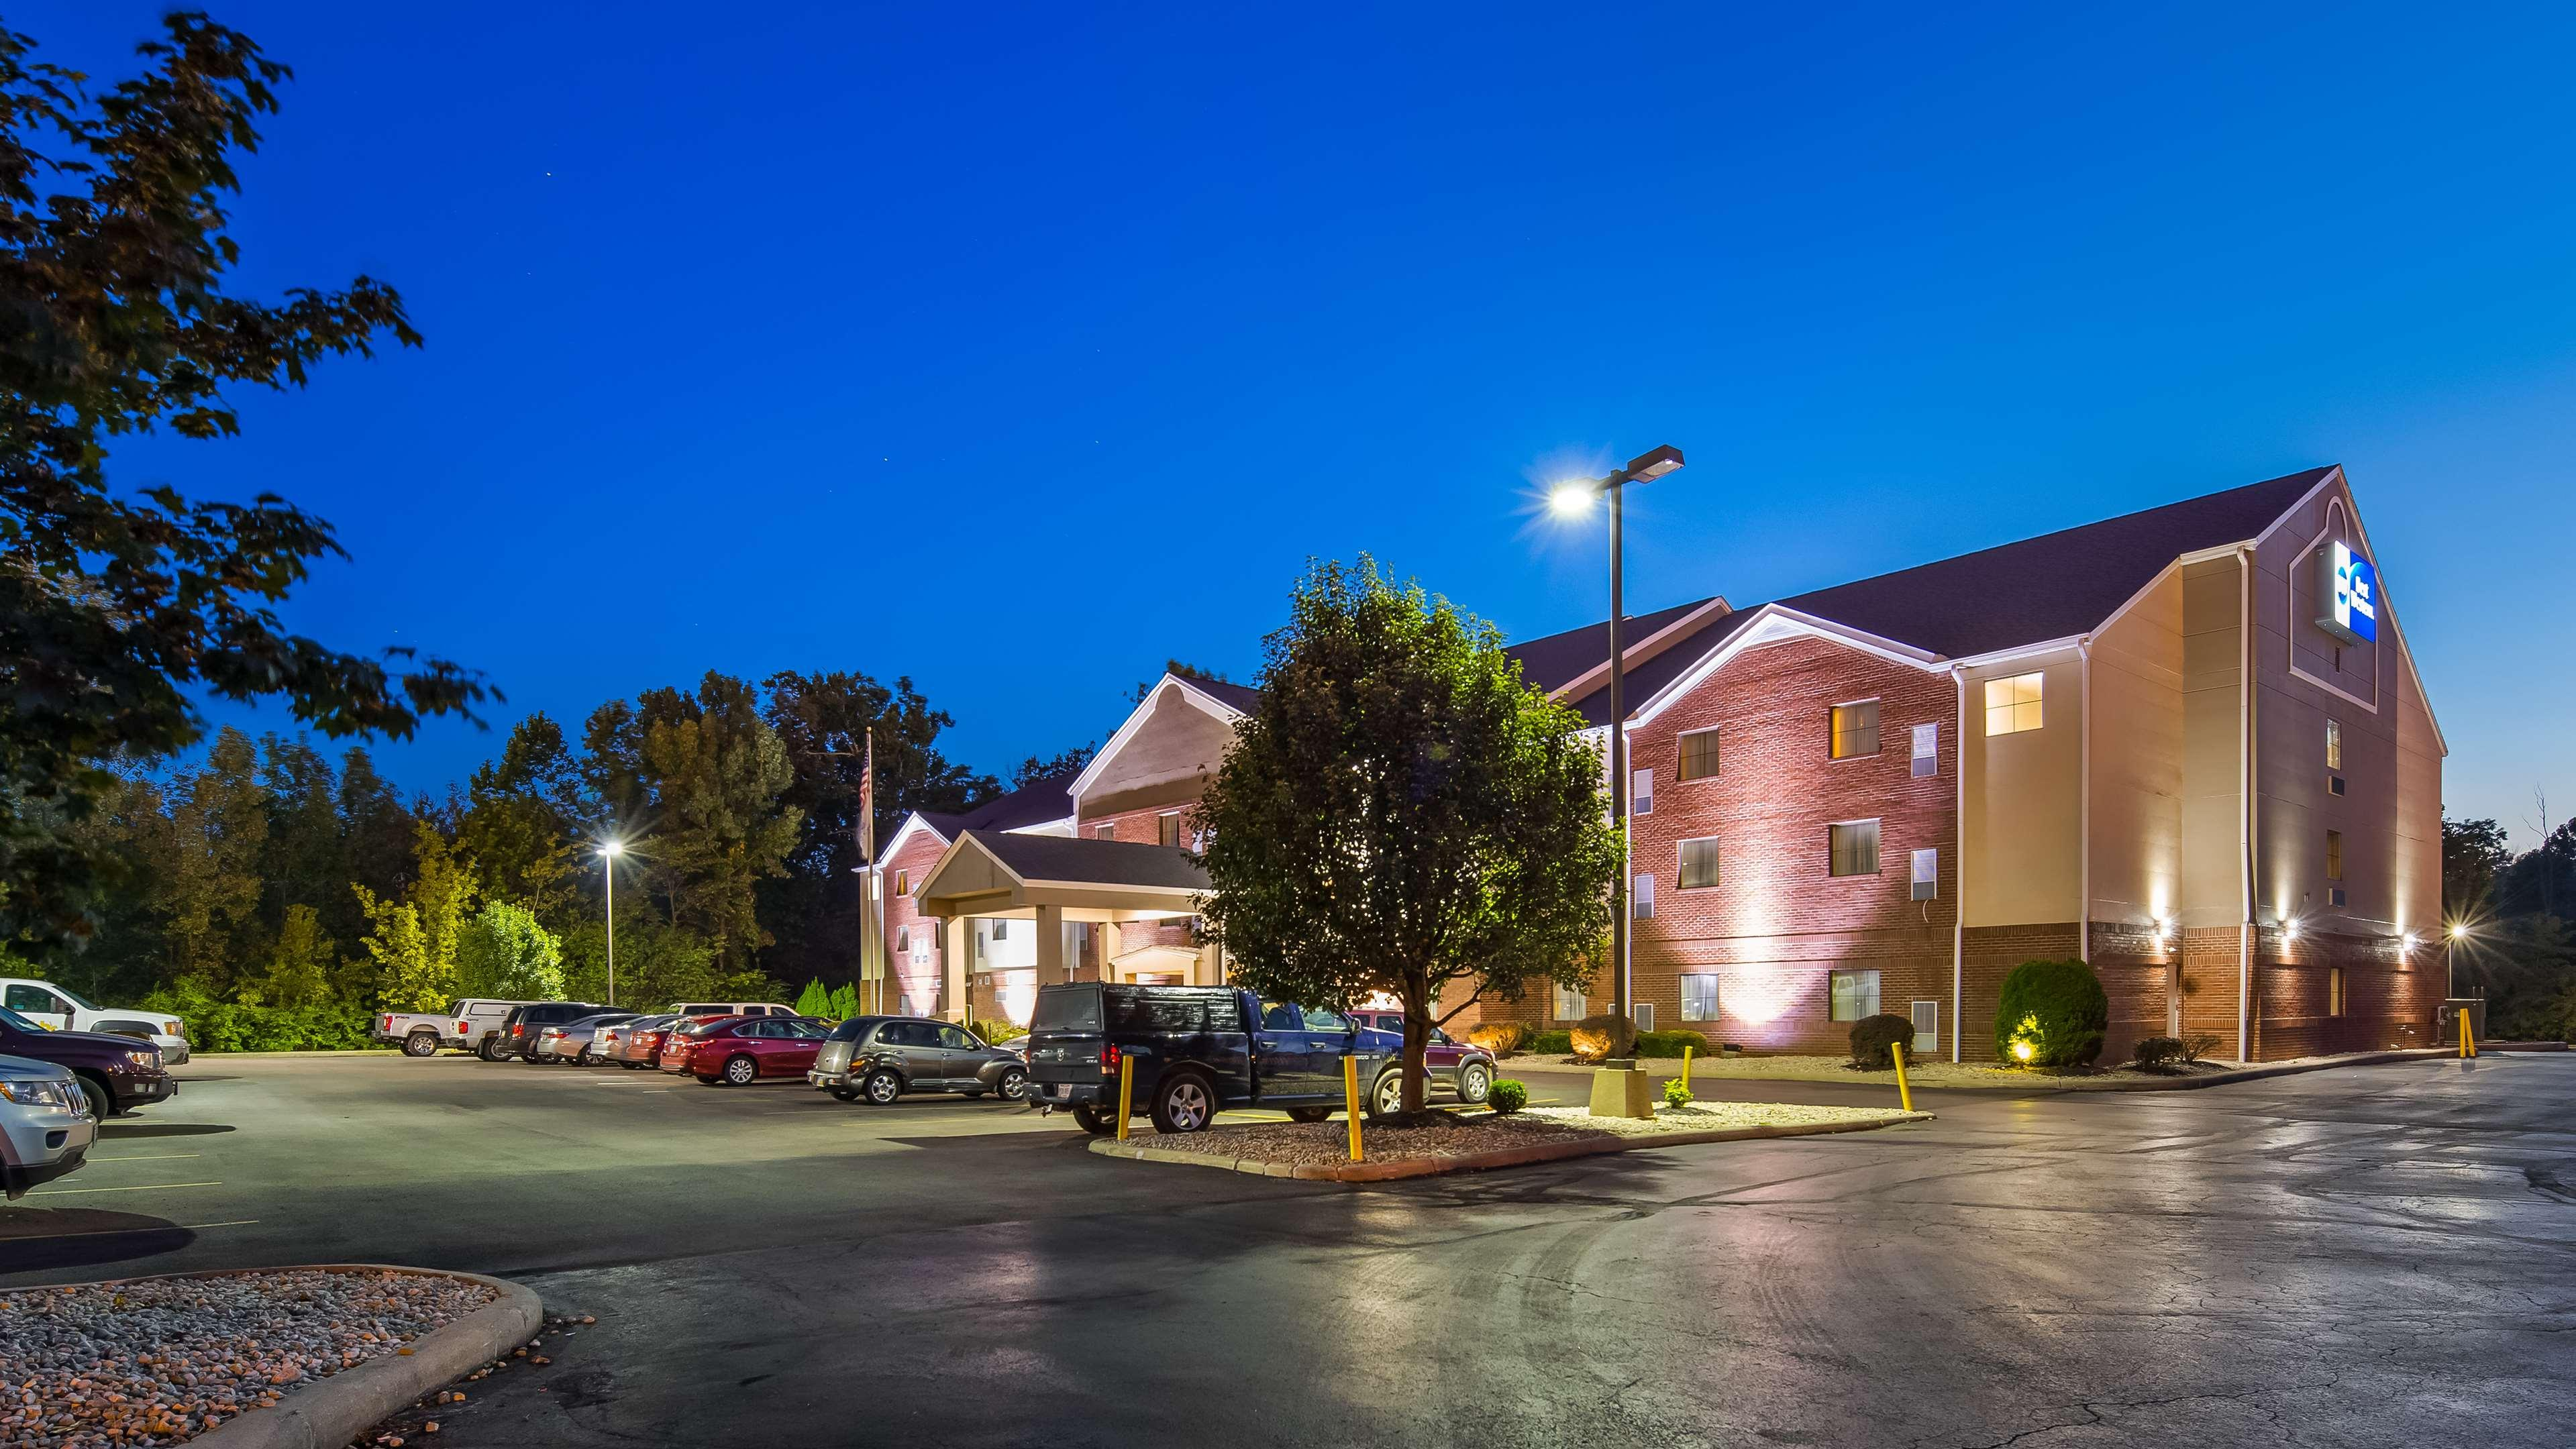 Best Western Plus Executive Suites - Columbus East, Fairfield